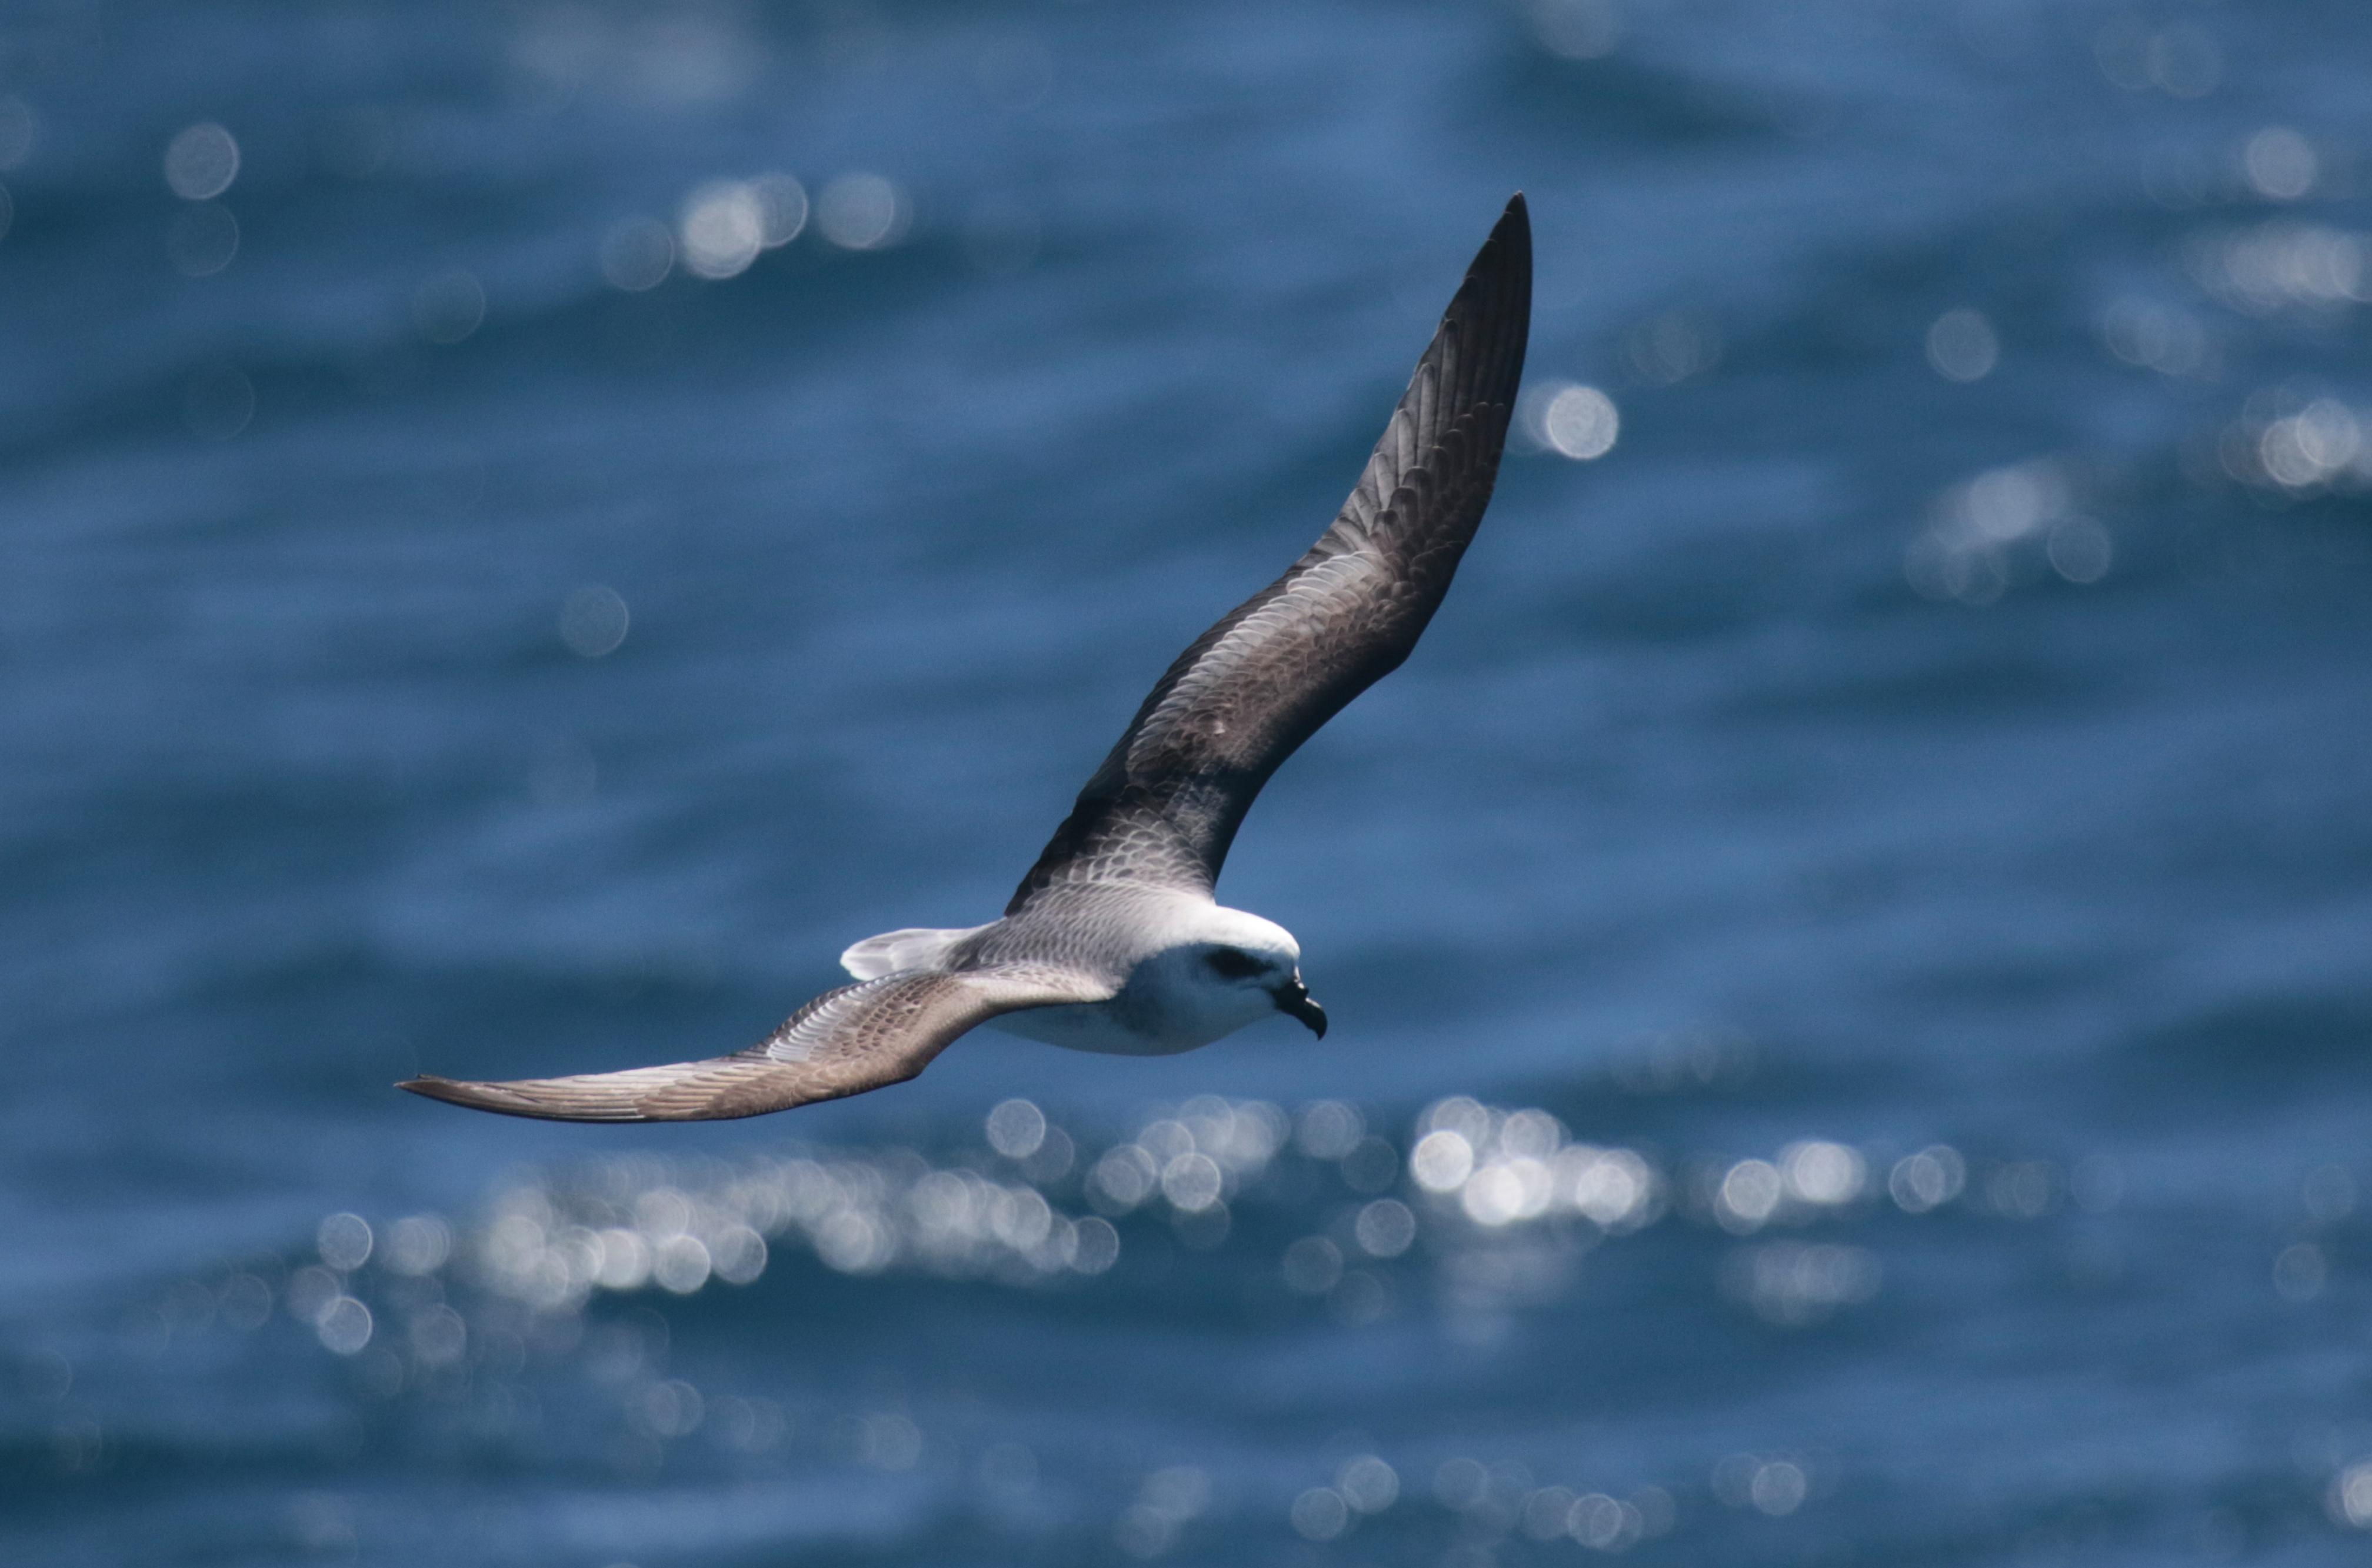 Birdswing ~ Port Fairy Pelagic Tour Reports